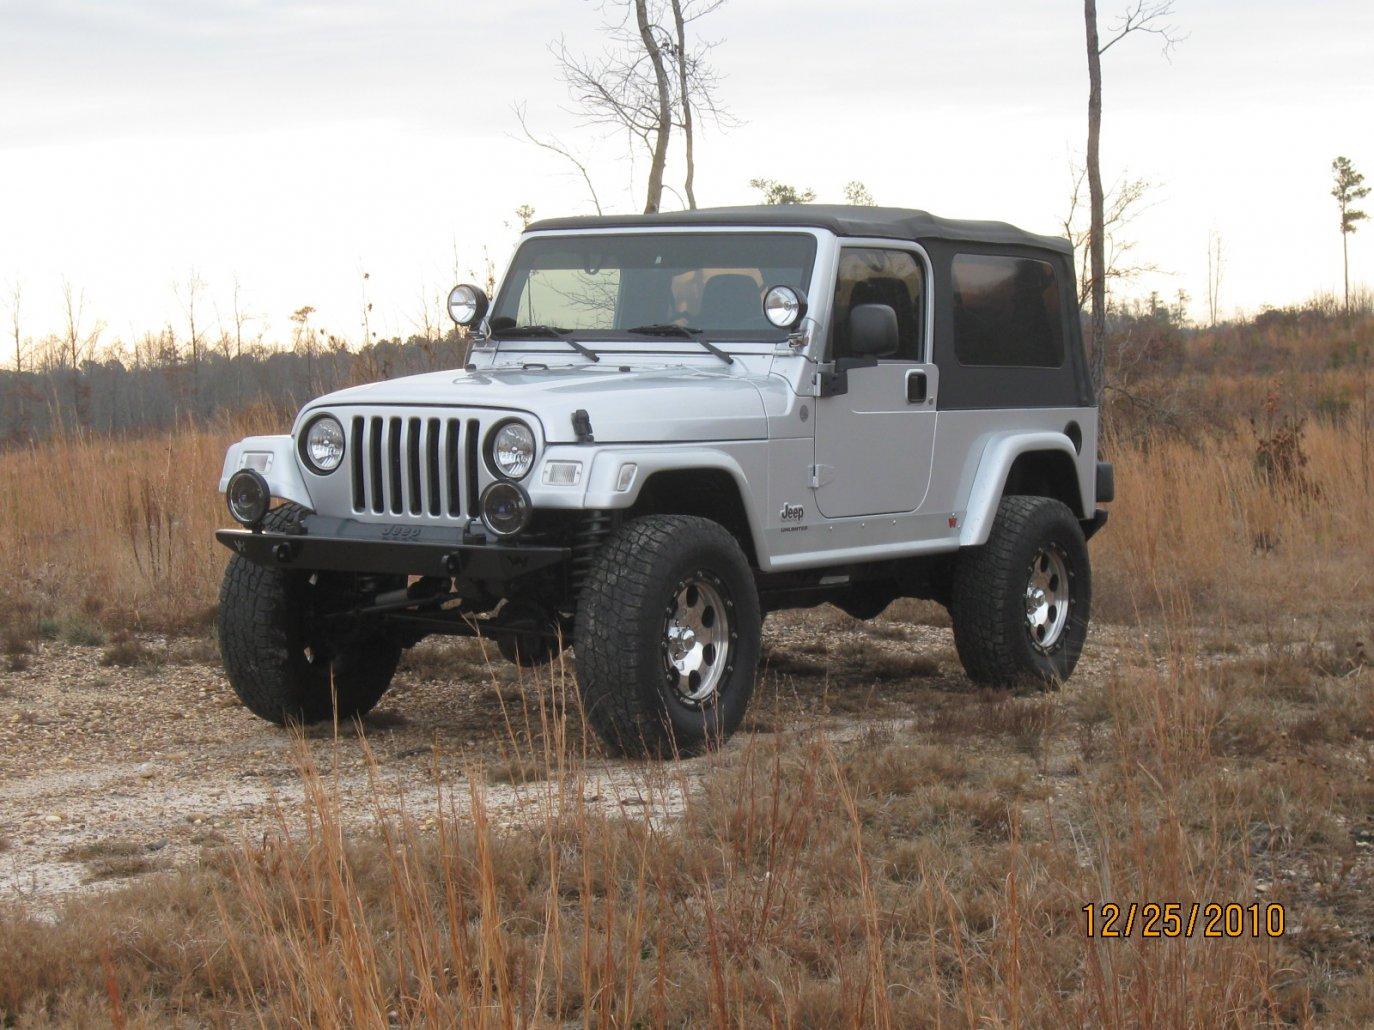 jeep-wheeling-stables-dec-25-2010-2.jpg